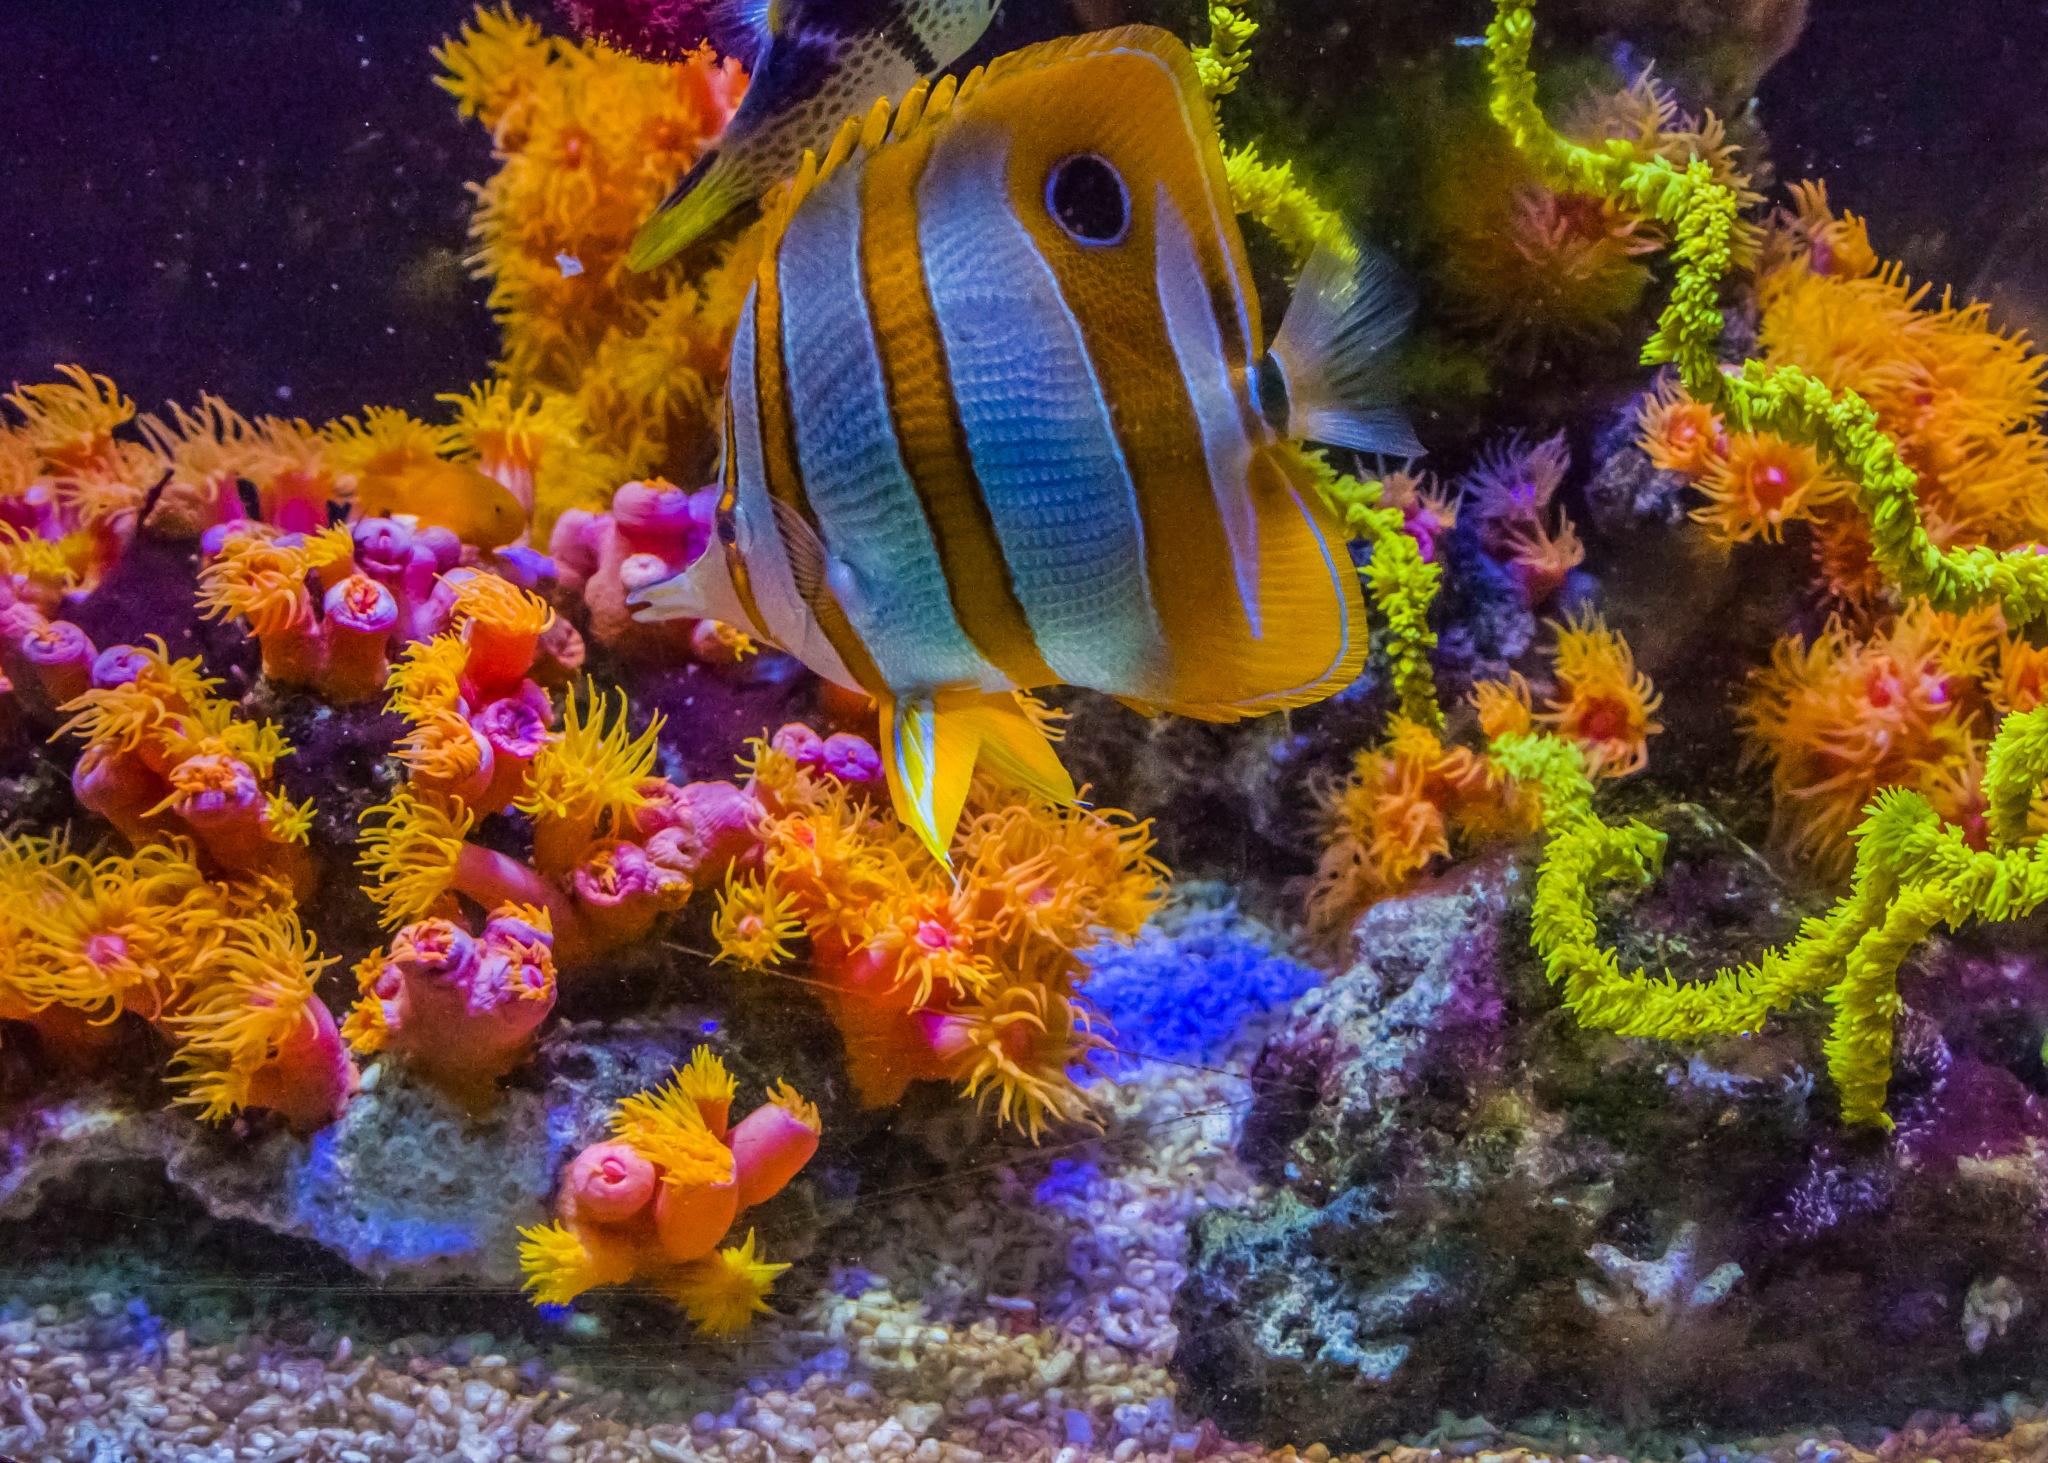 Disguised as Nemo by djaffar adane